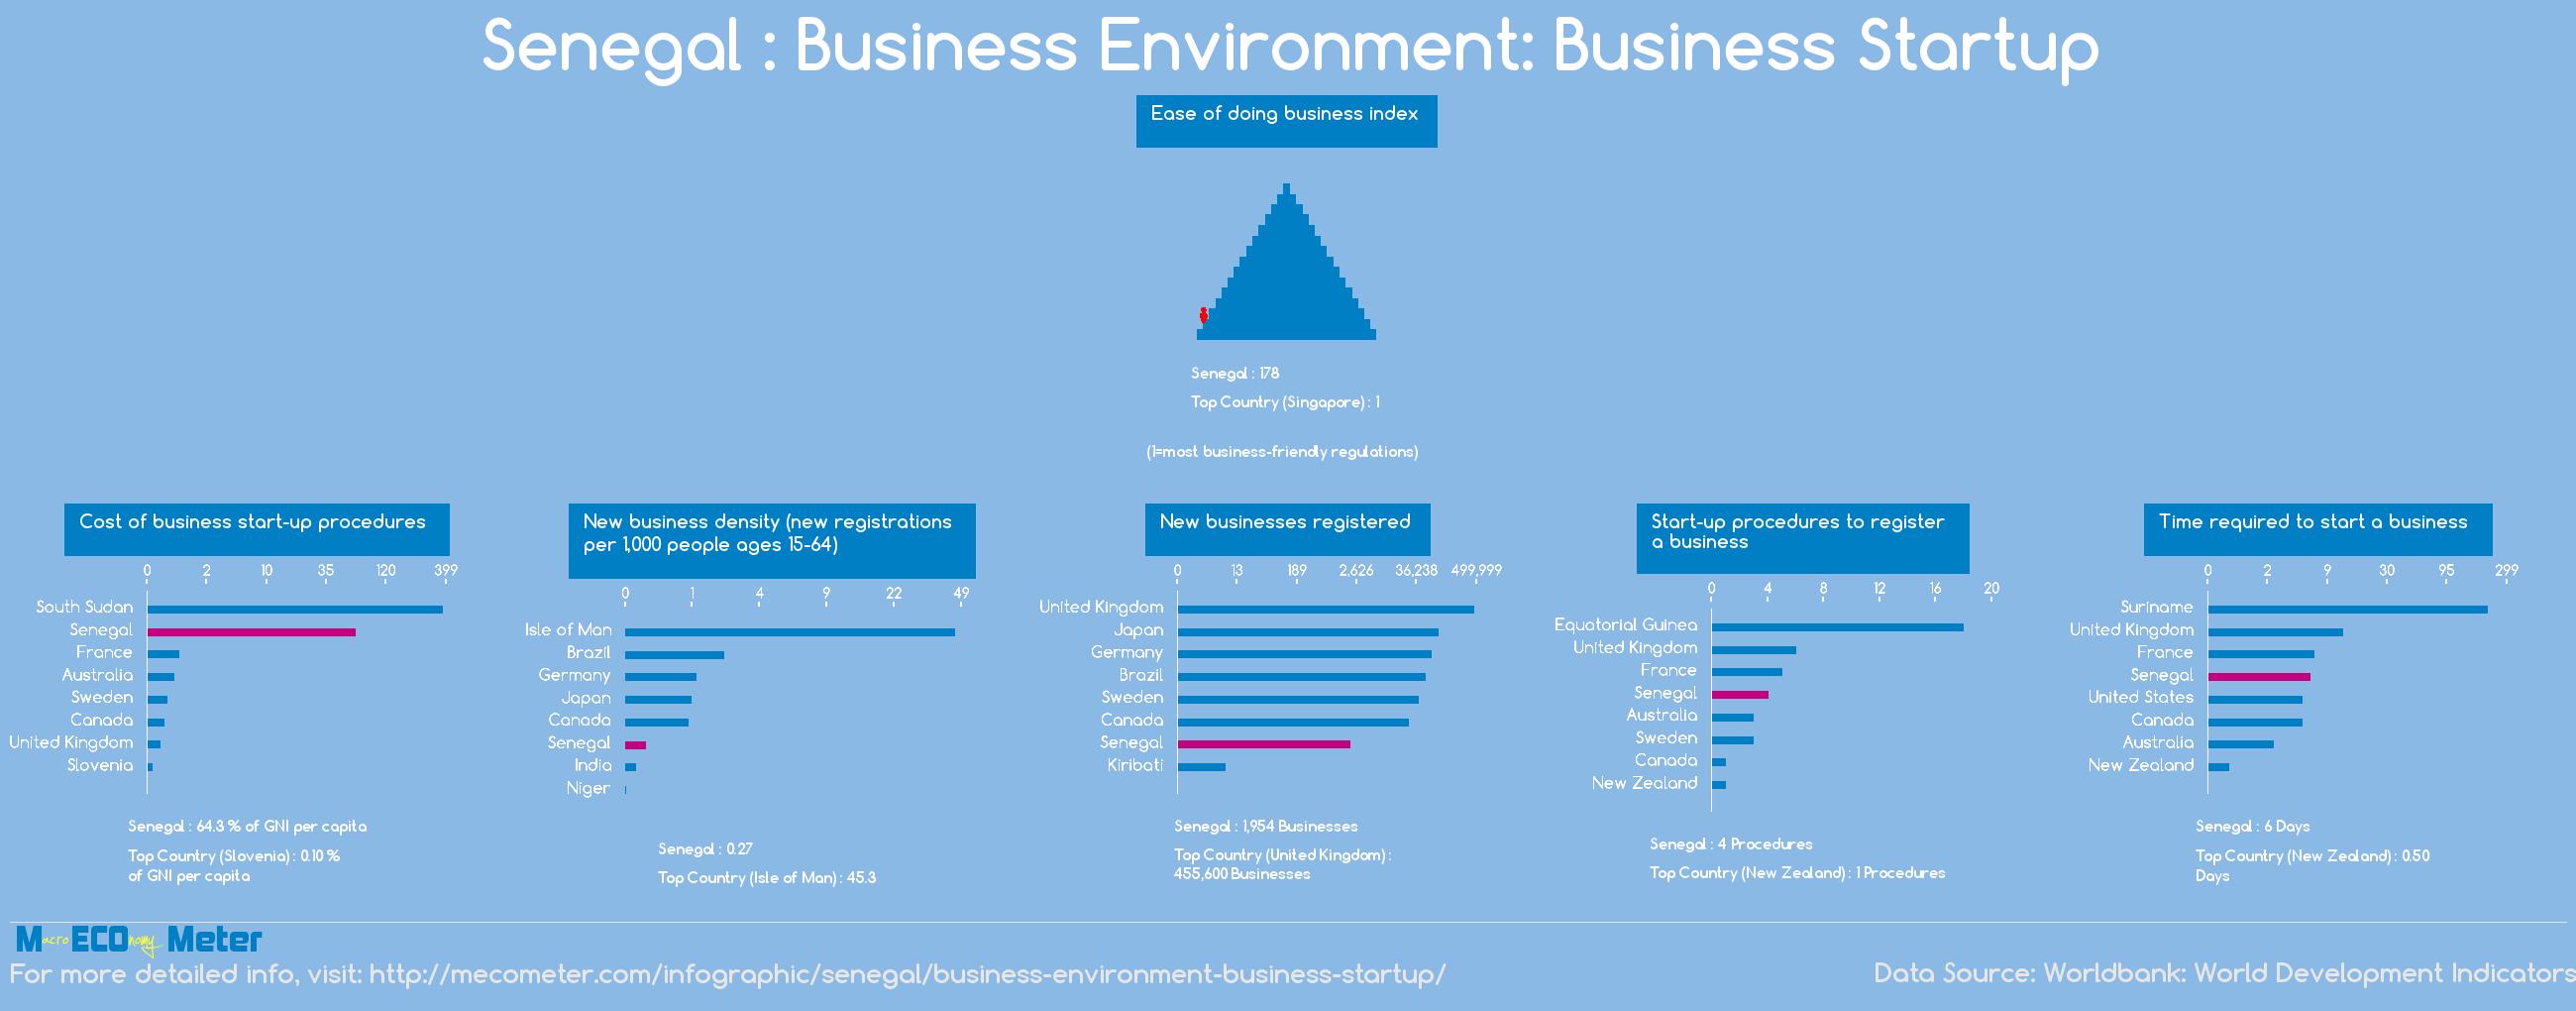 Senegal : Business Environment: Business Startup